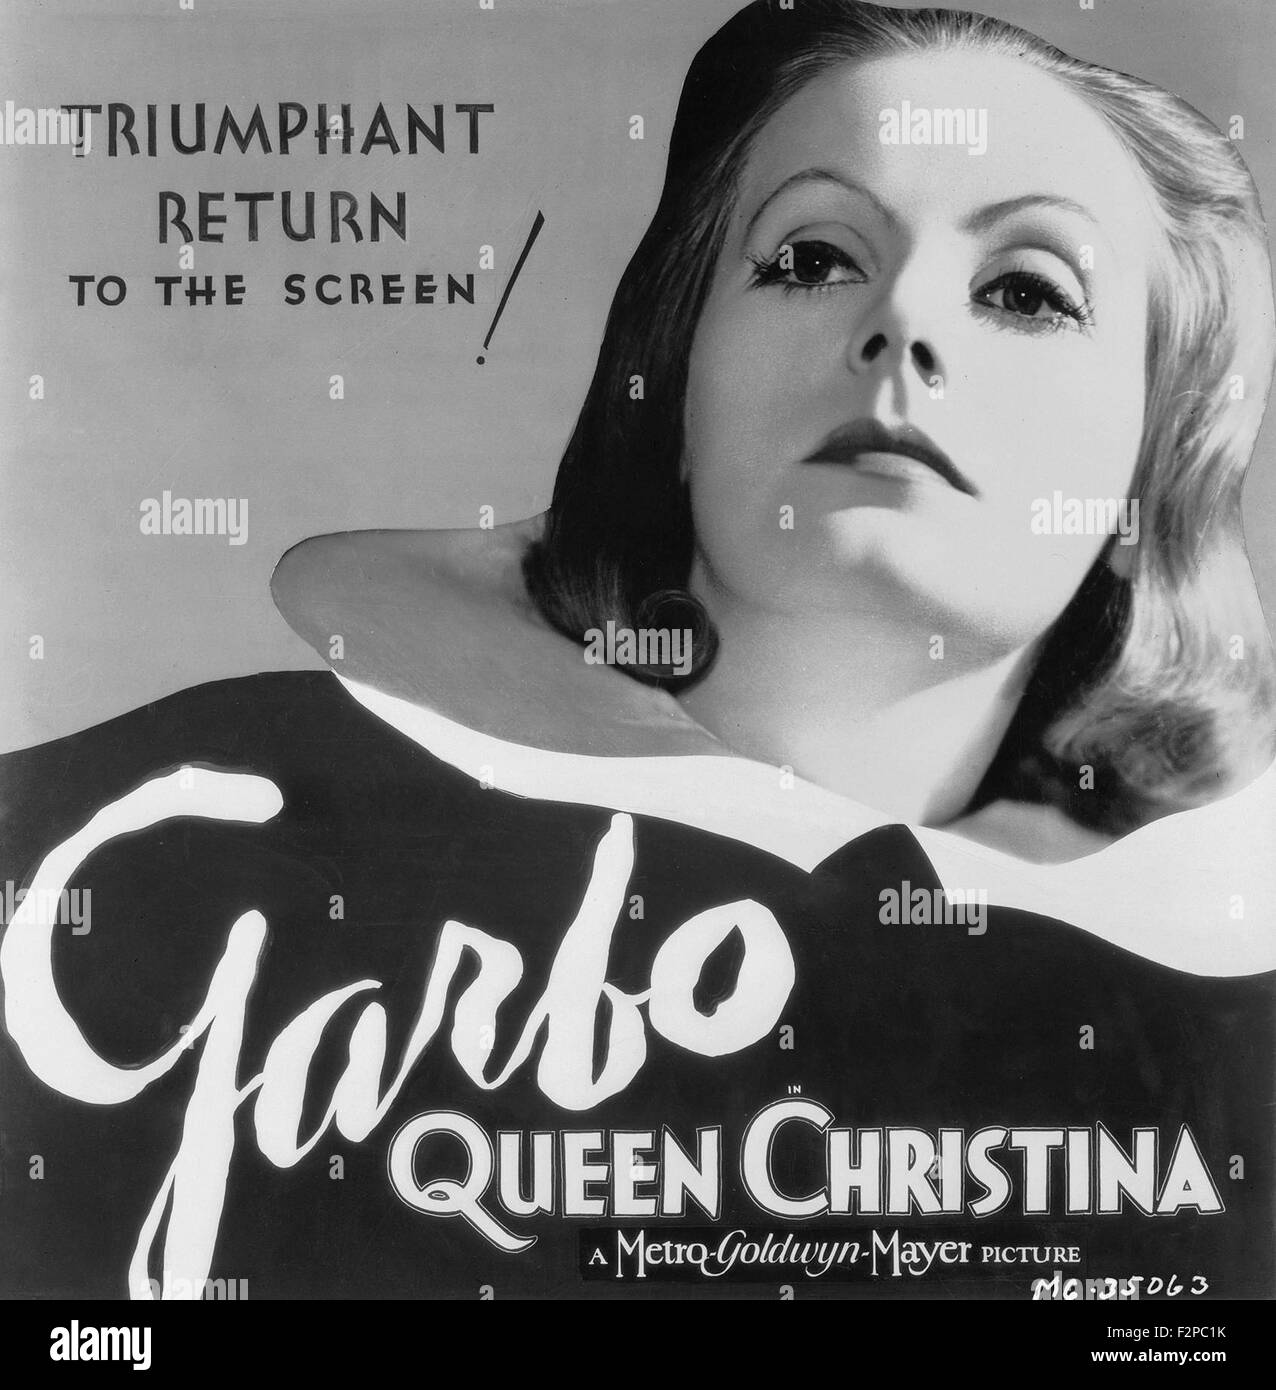 http://c8.alamy.com/comp/F2PC1K/queen-christina-movie-poster-F2PC1K.jpg